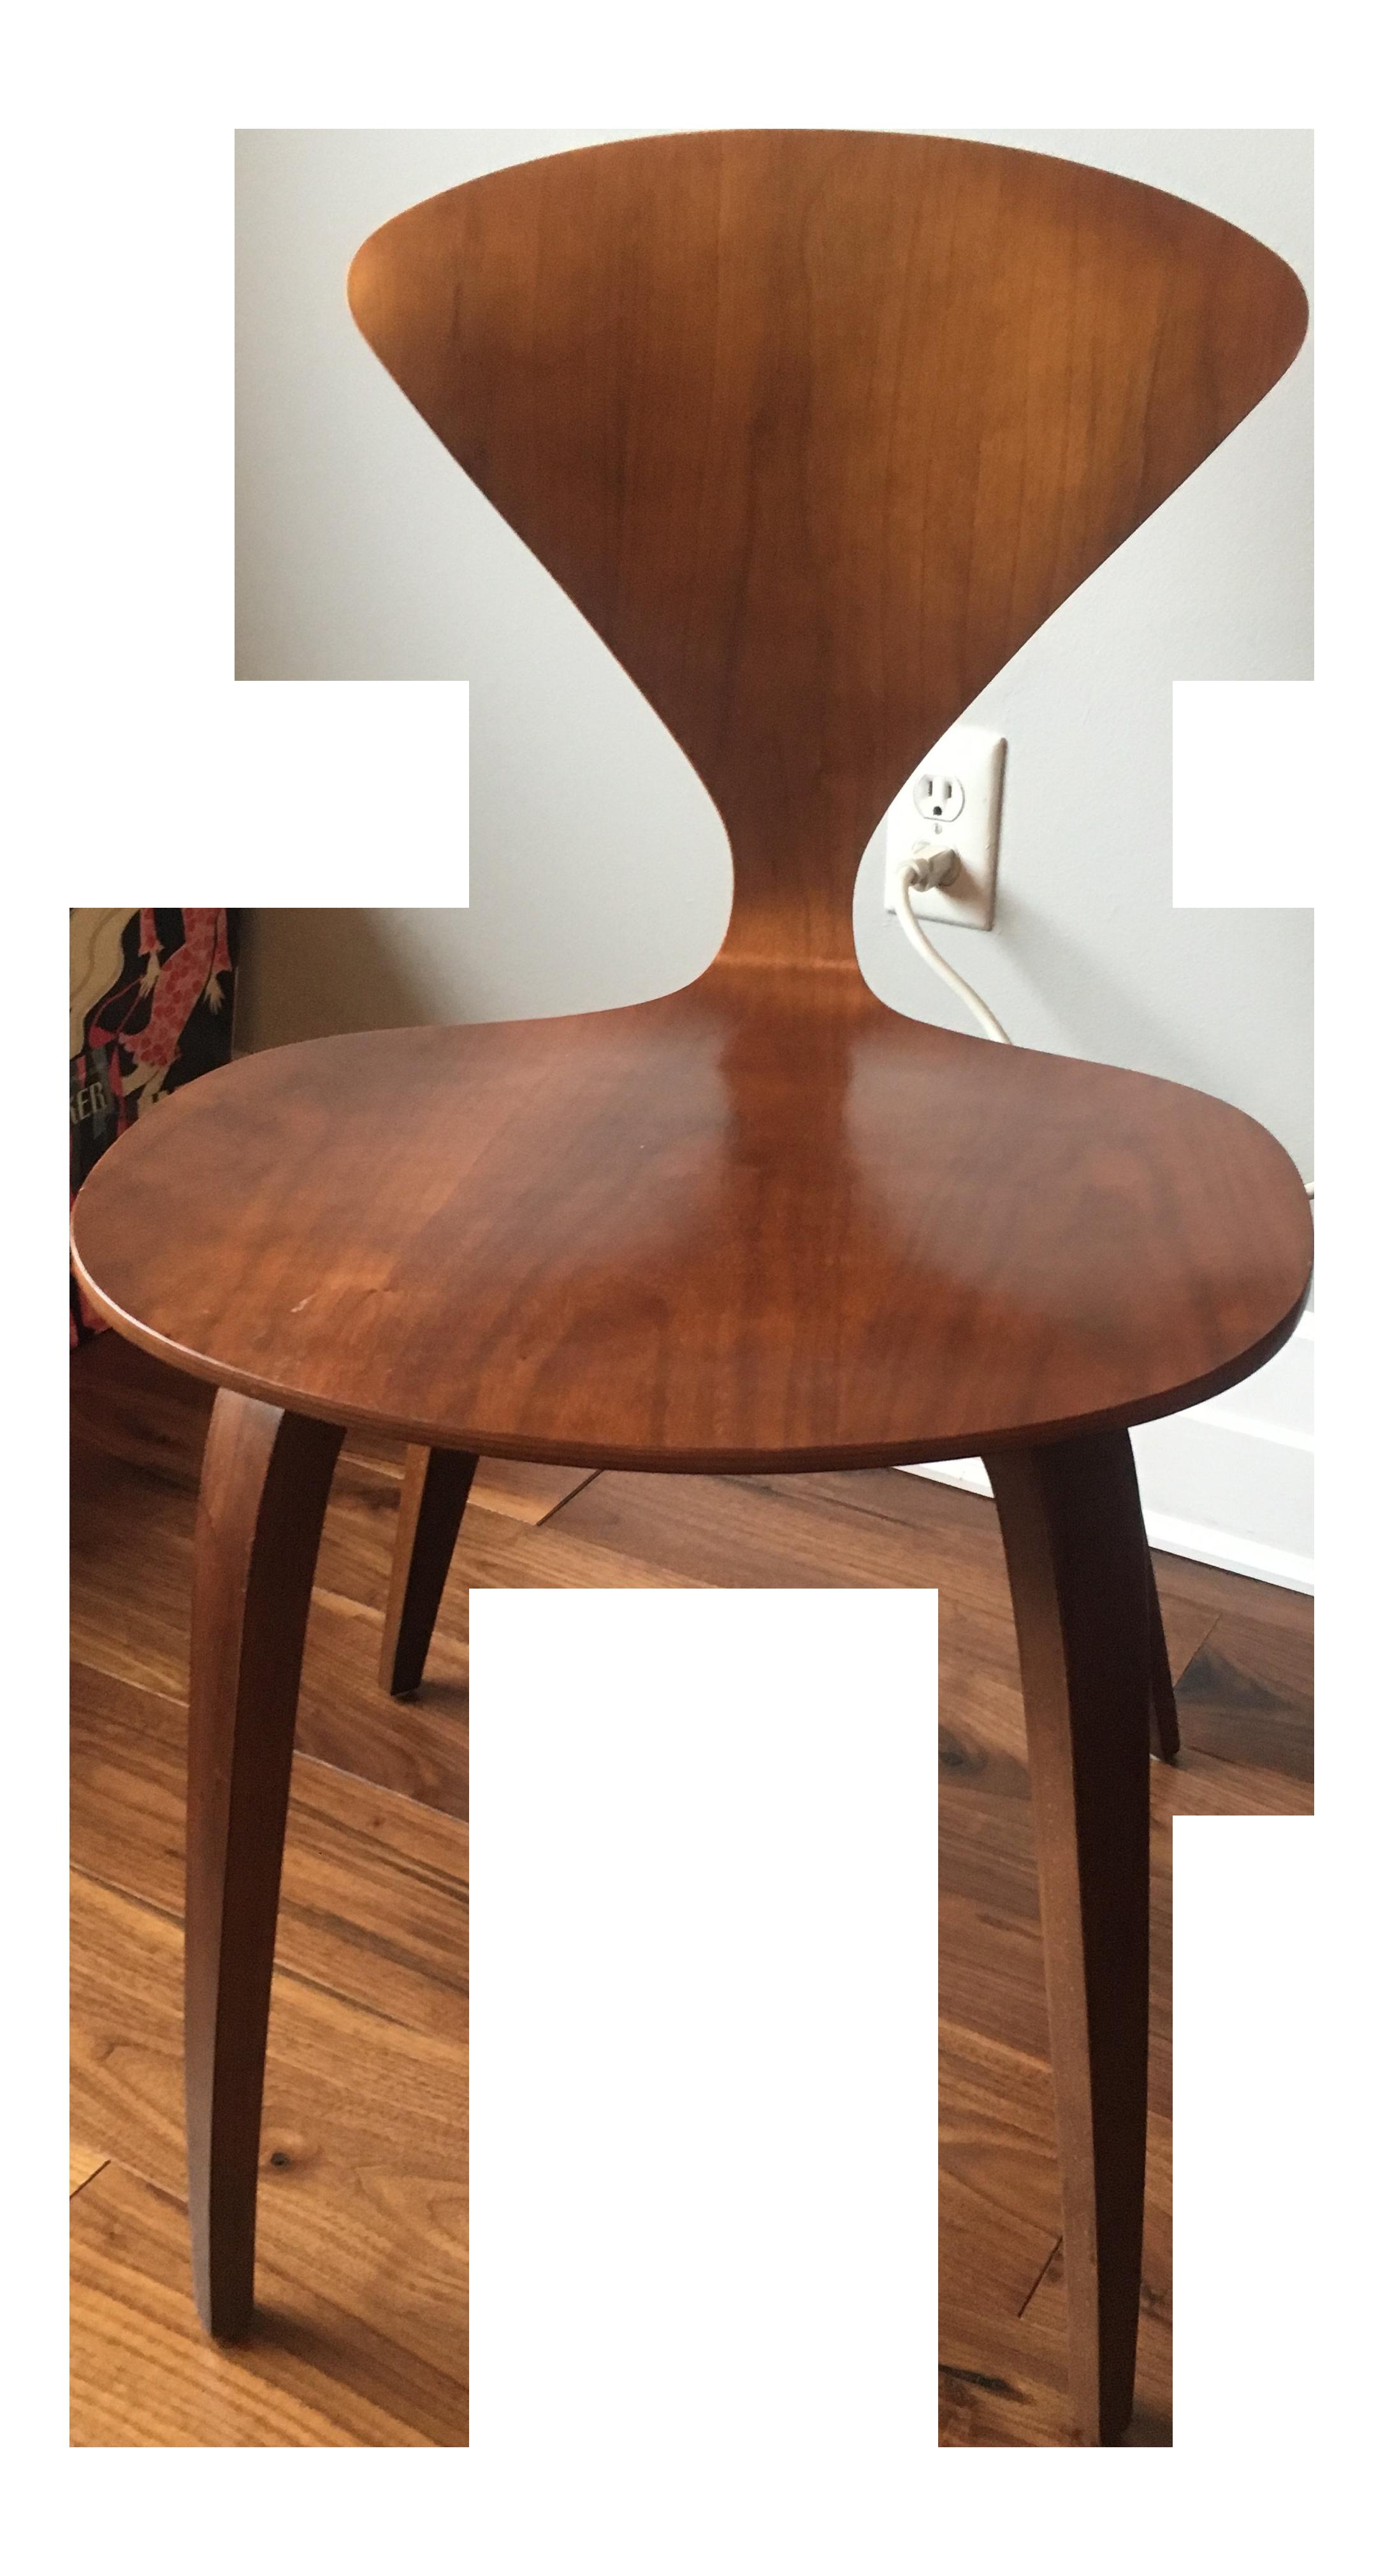 Beau Norman Cherner Molded Walnut Chair